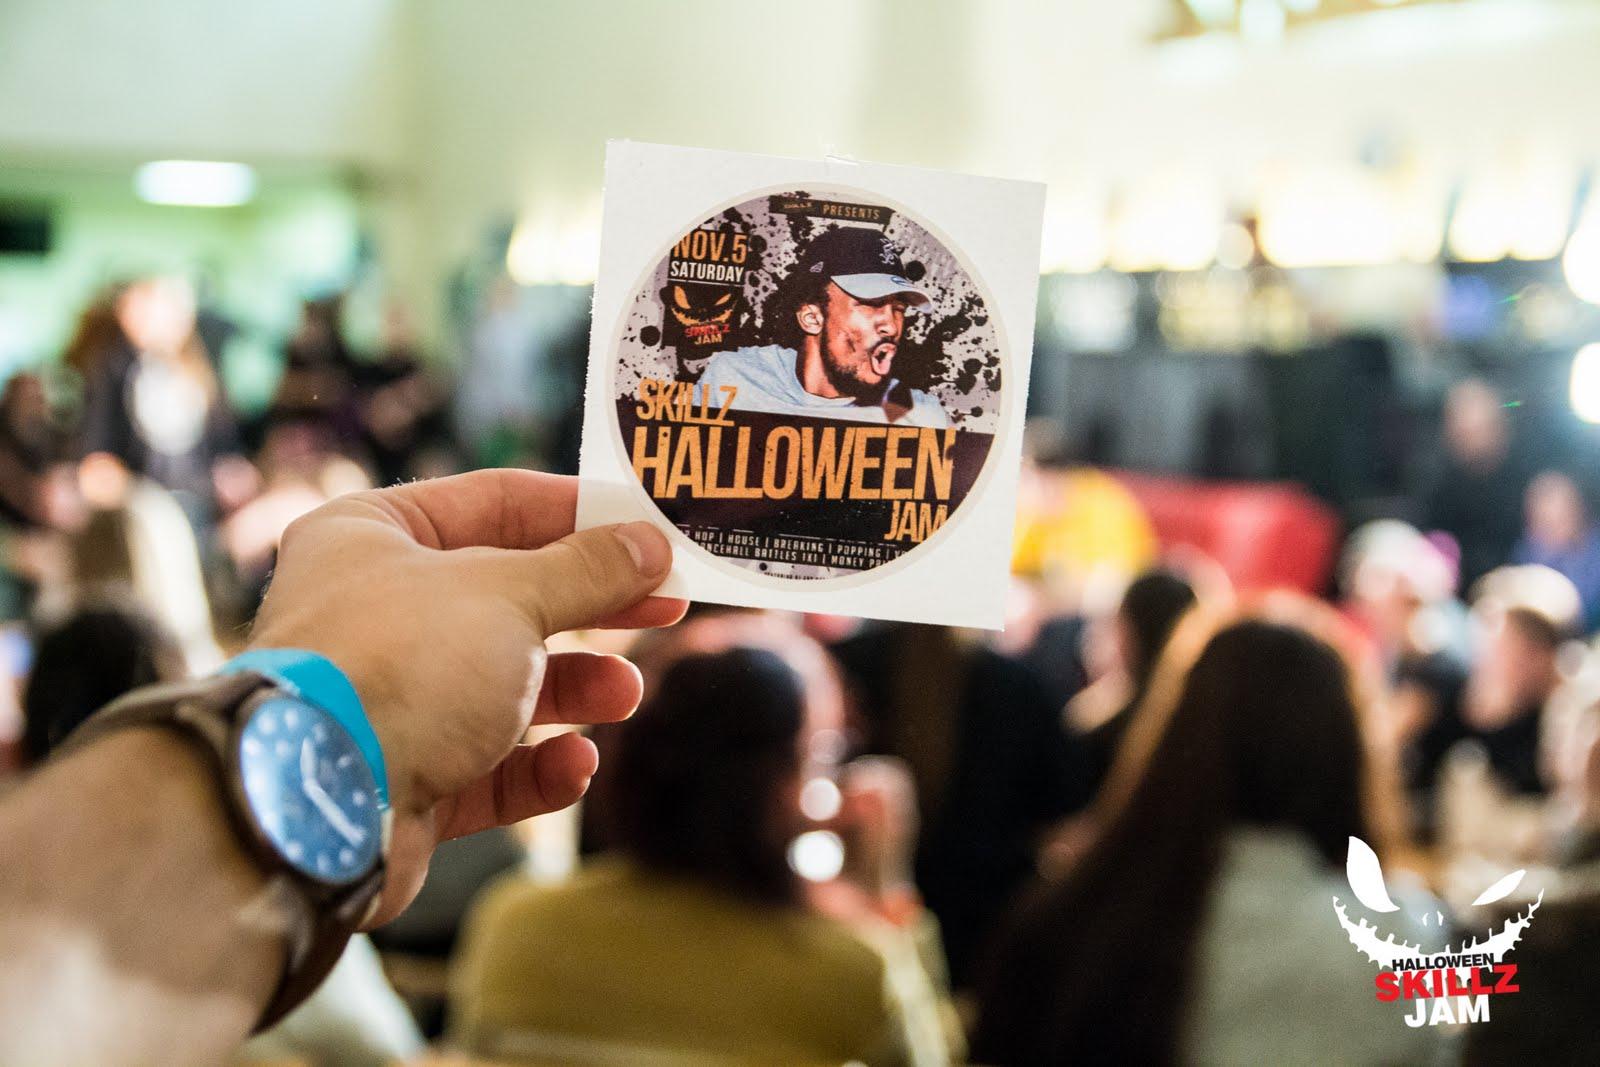 SKILLZ Halloween Jam 2016 by Tautvydas Tarasevicius - IMG_9735.jpg